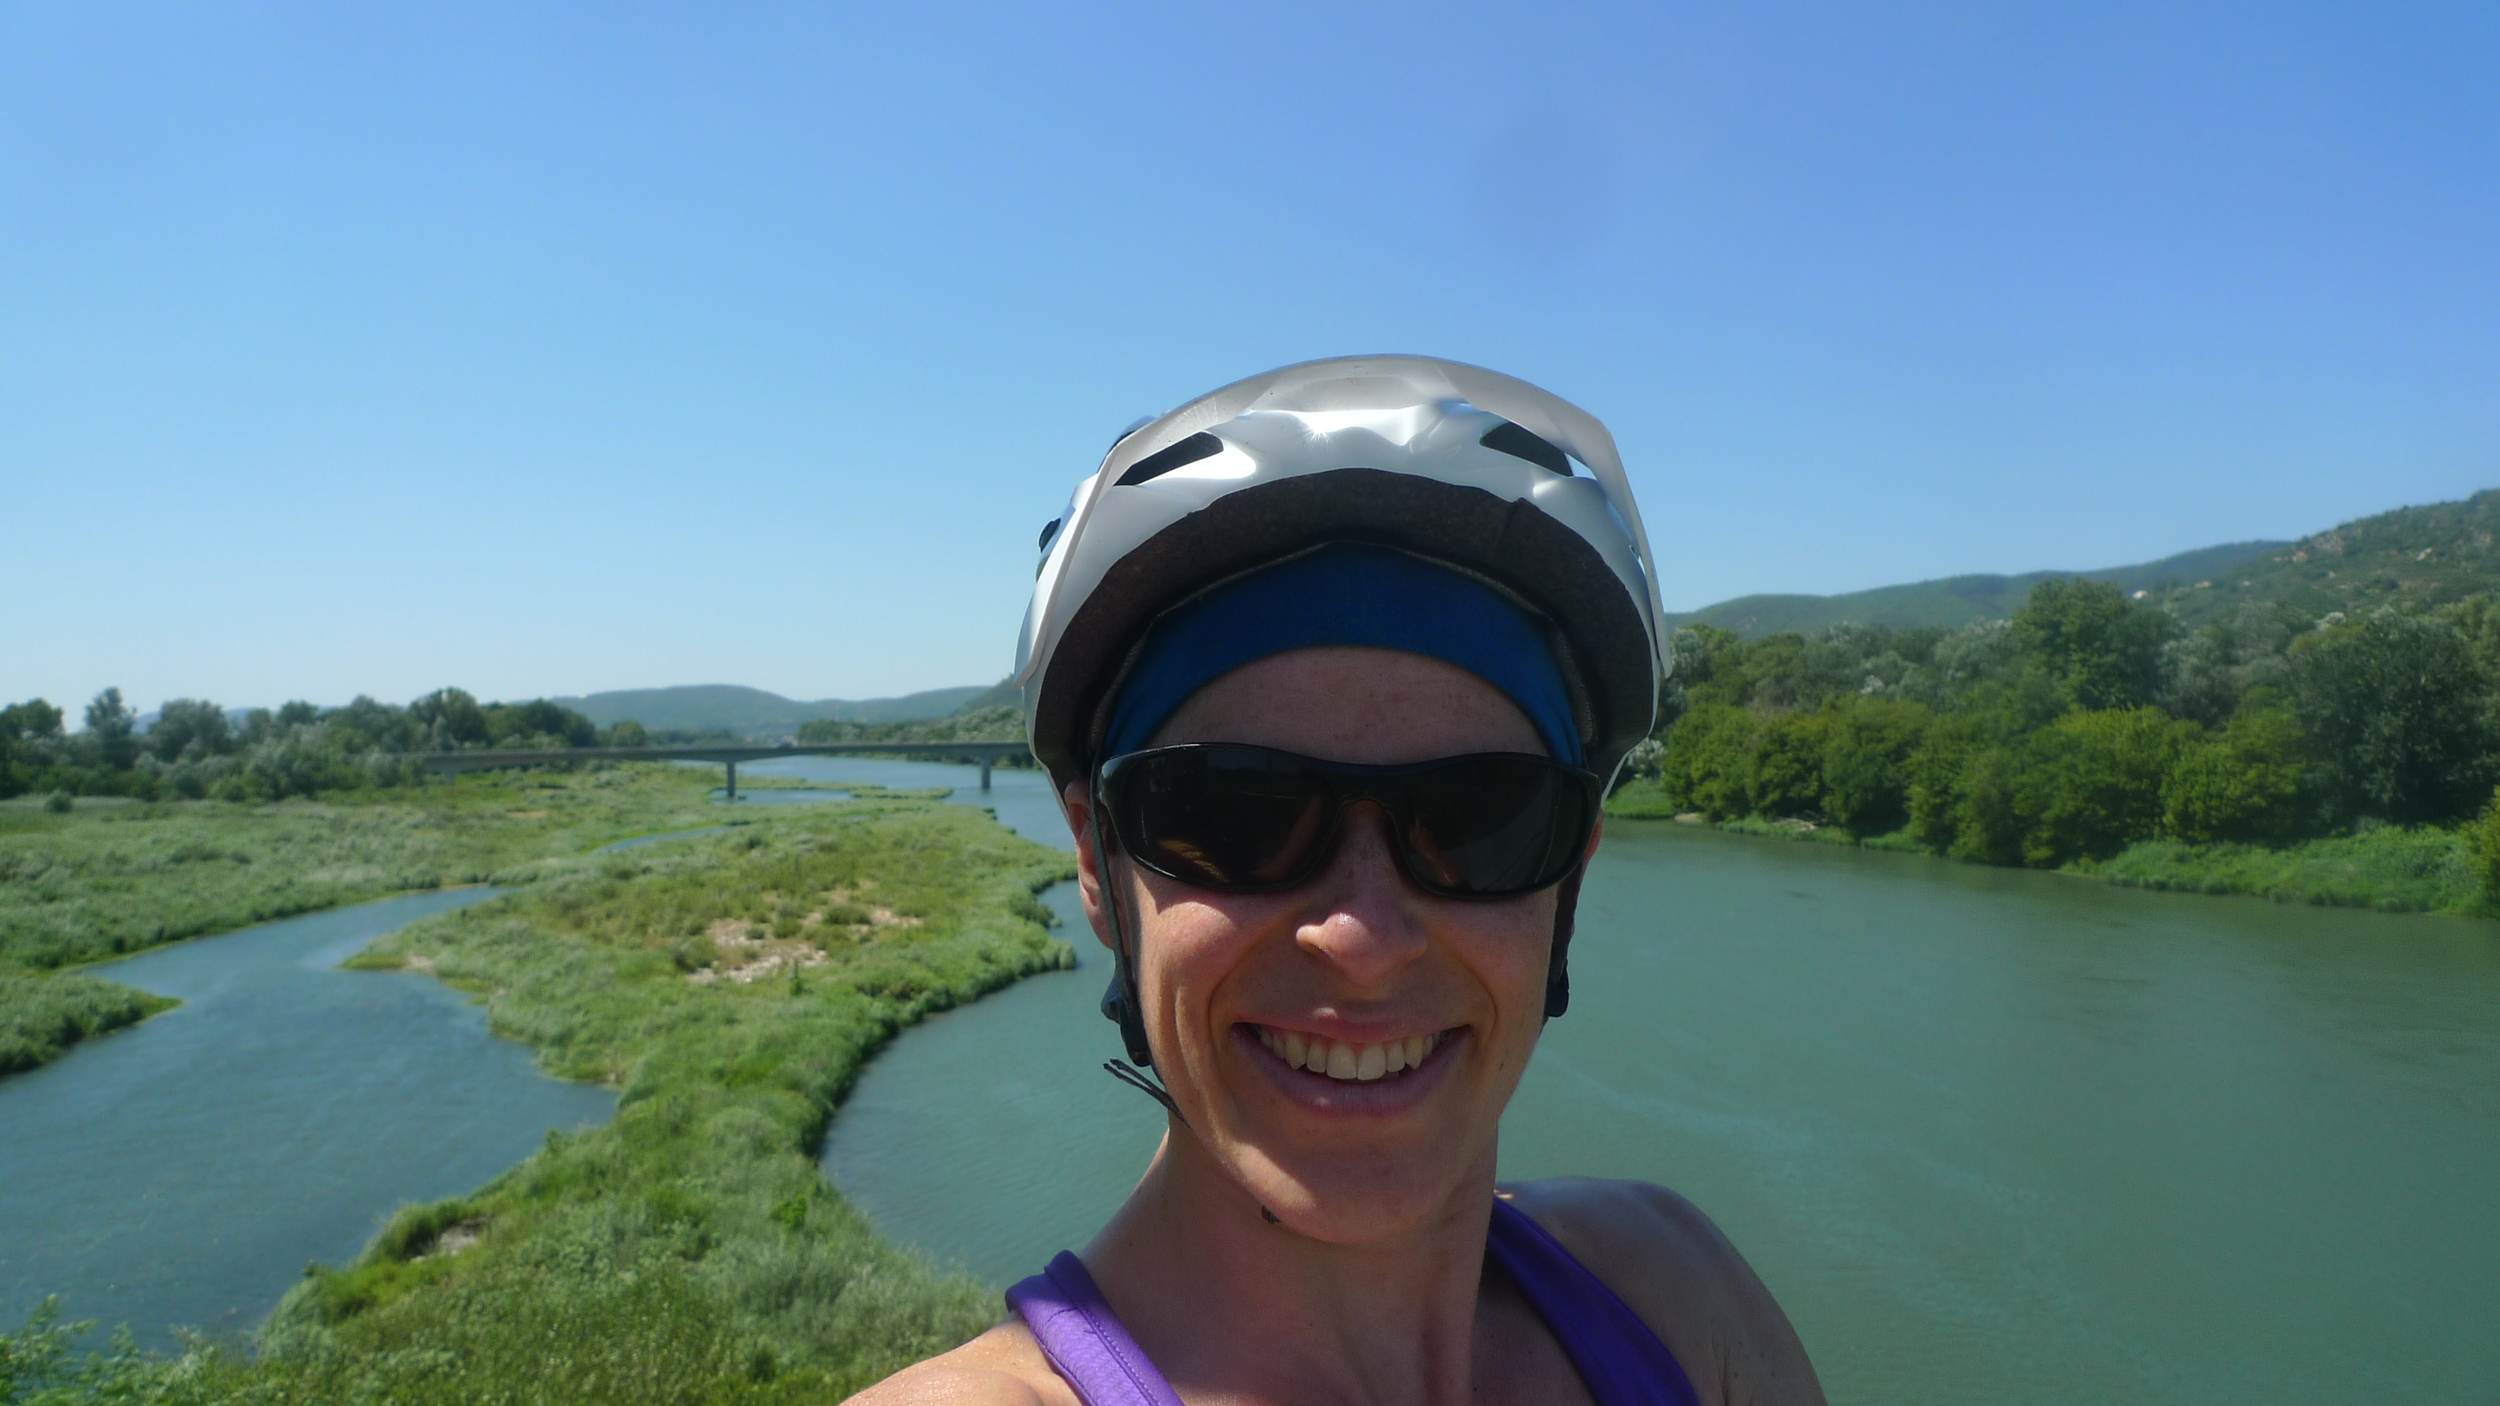 FRANCE - Biking the Rhone River